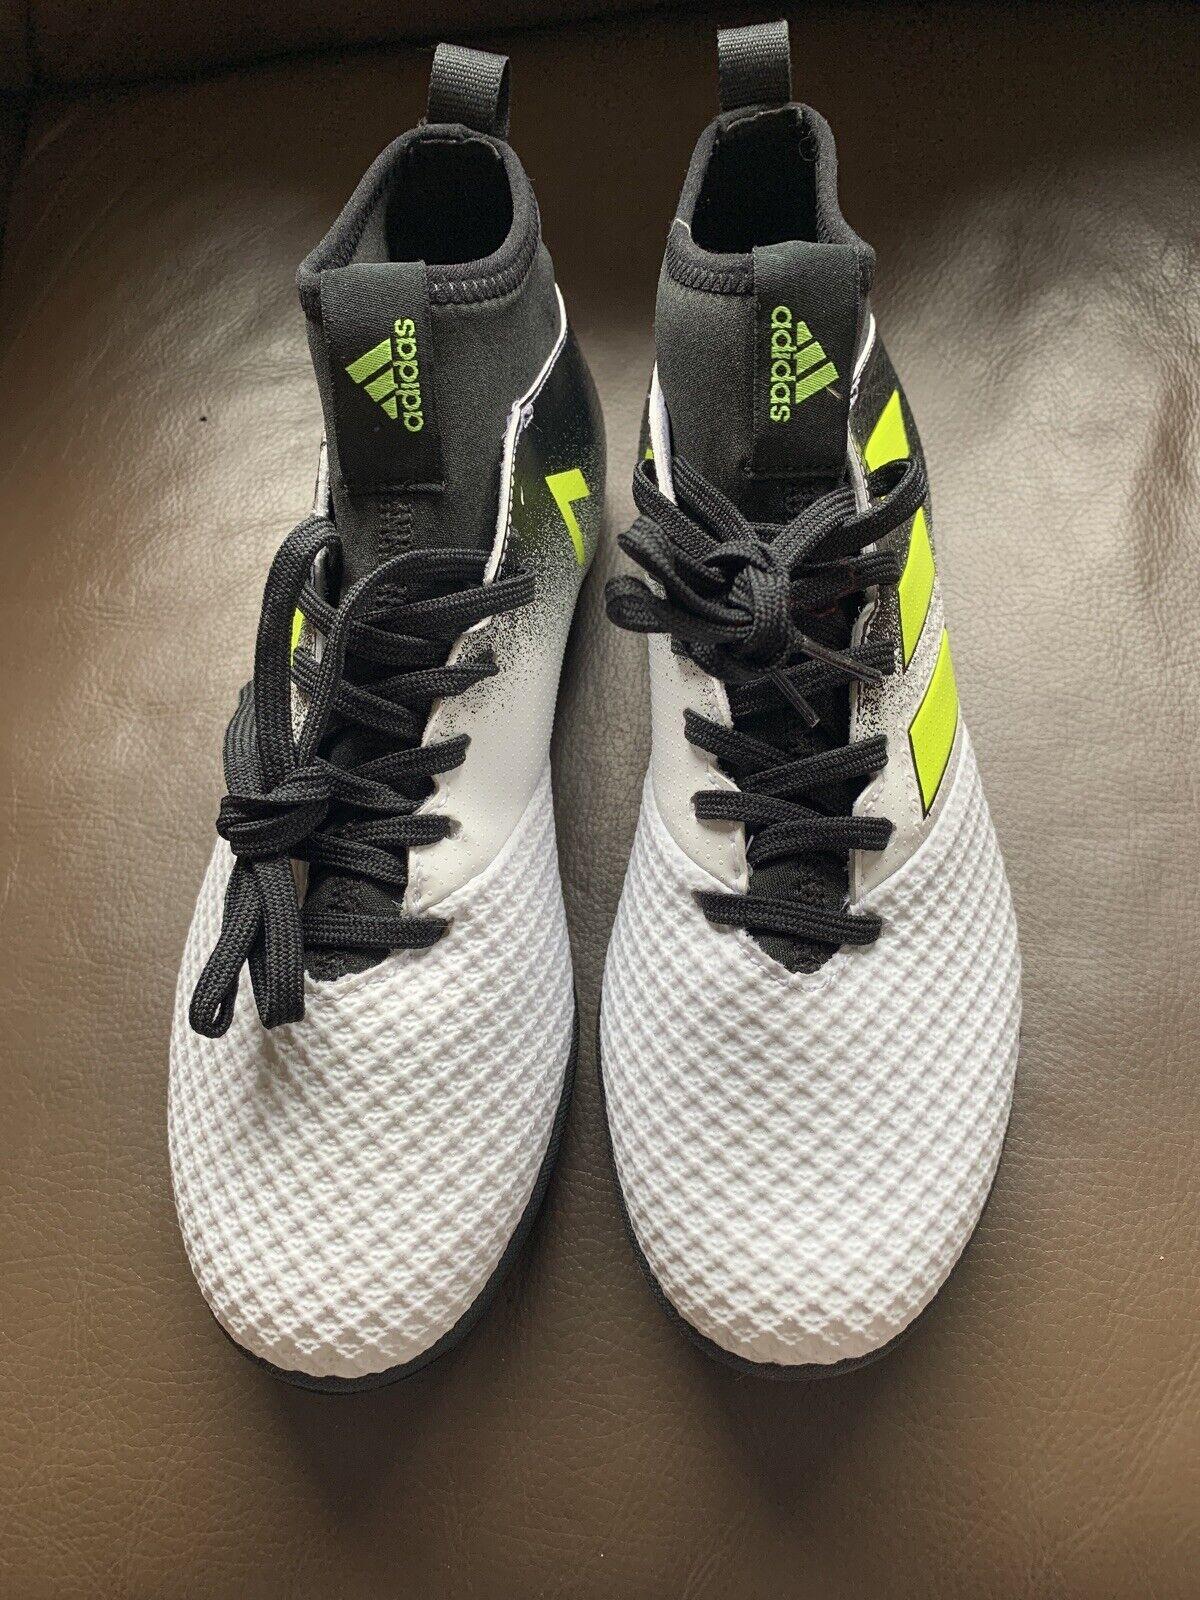 Adidas ACE Tango 17.3 TF Mens Soccer